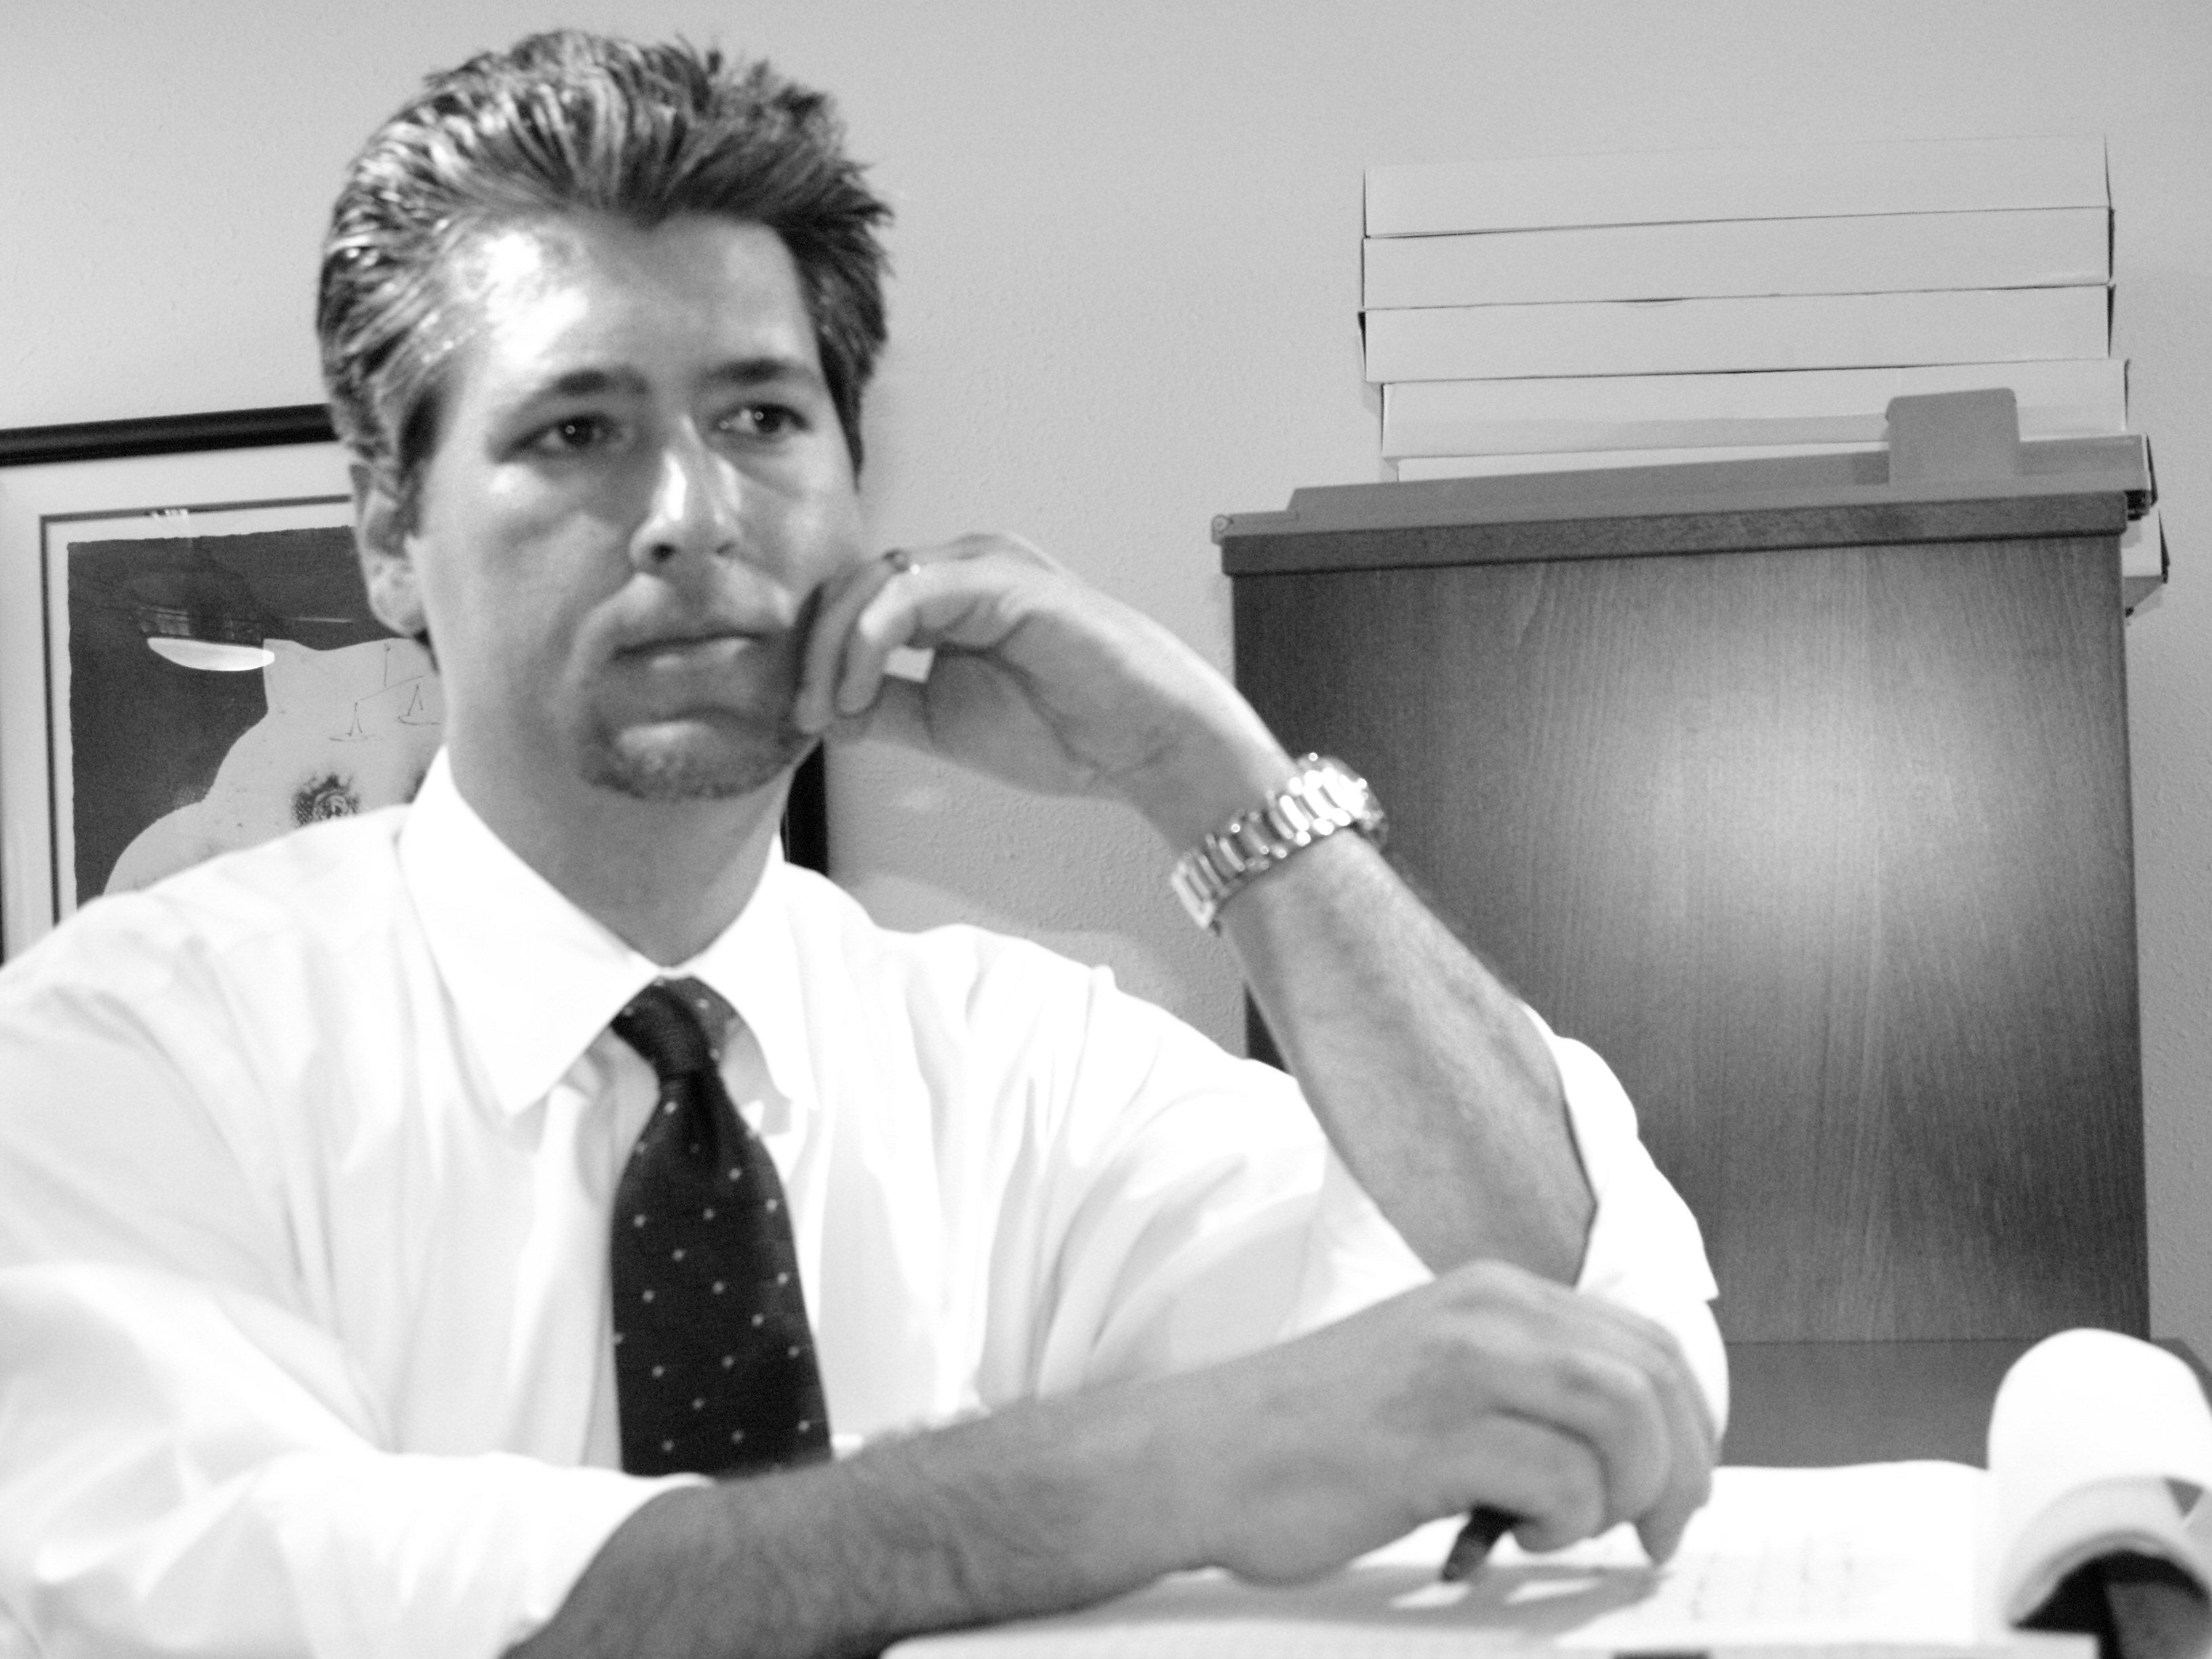 Jason W. Barger